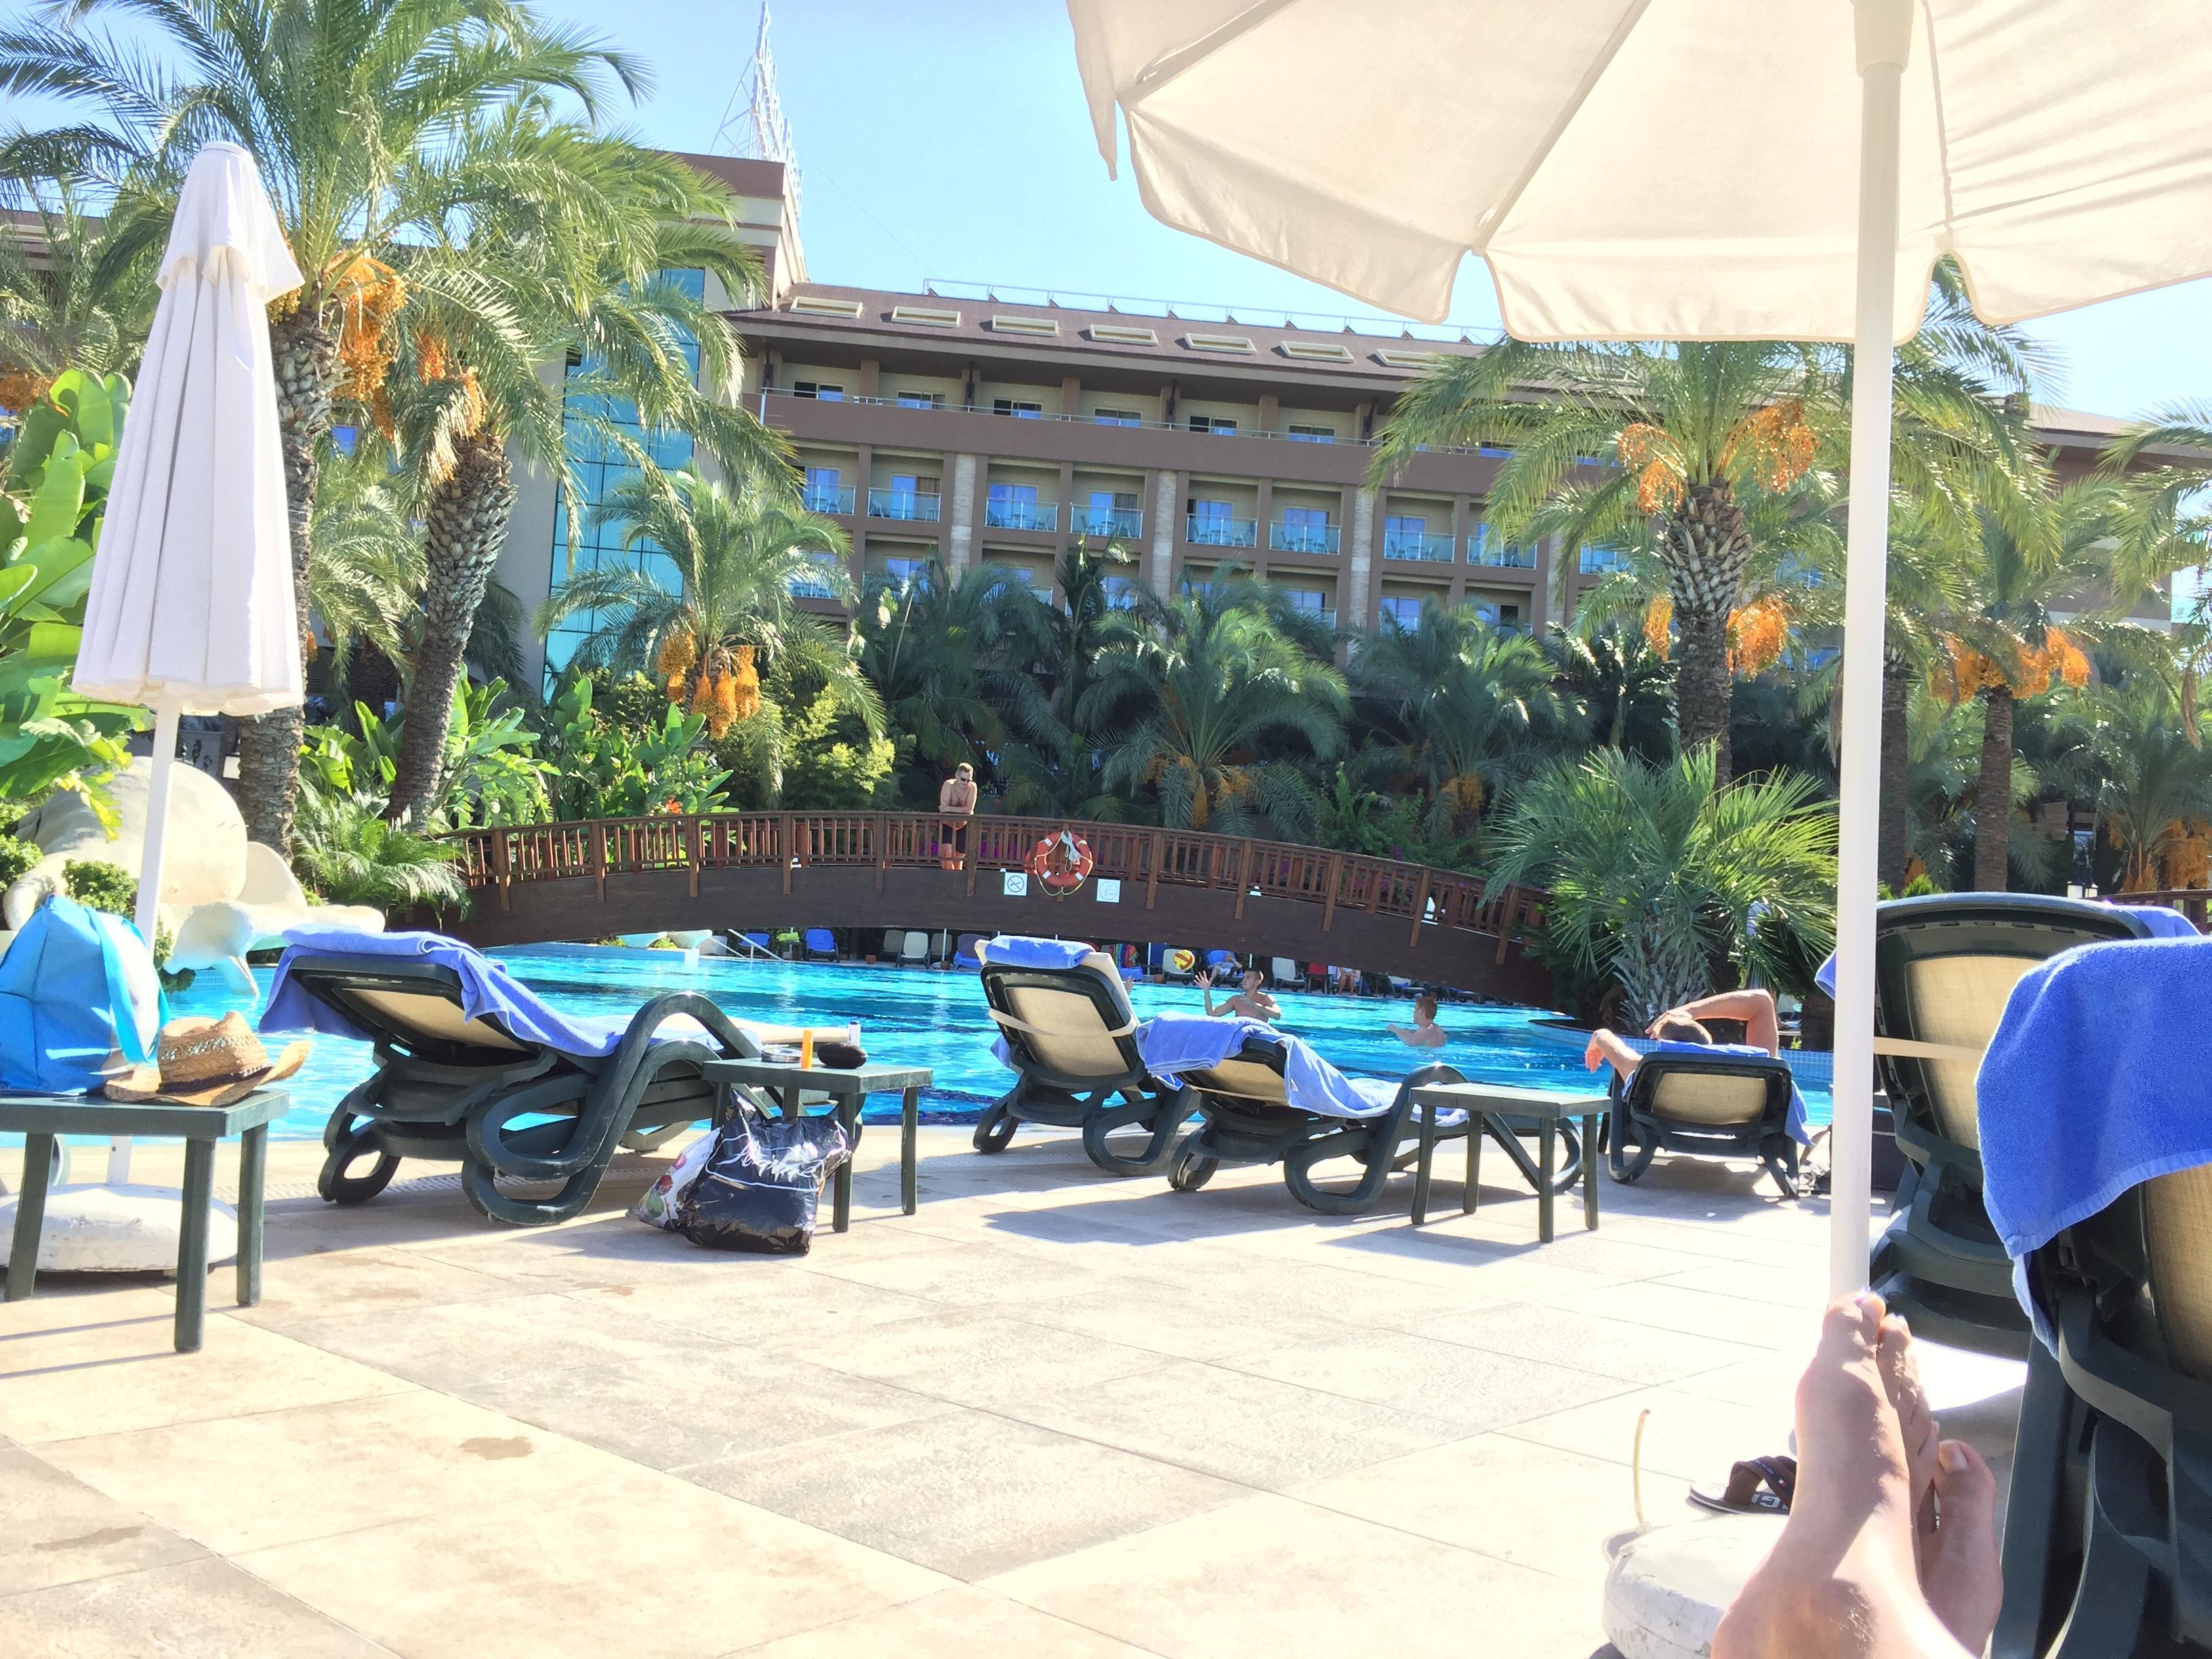 intim massasje aleksandra hotell